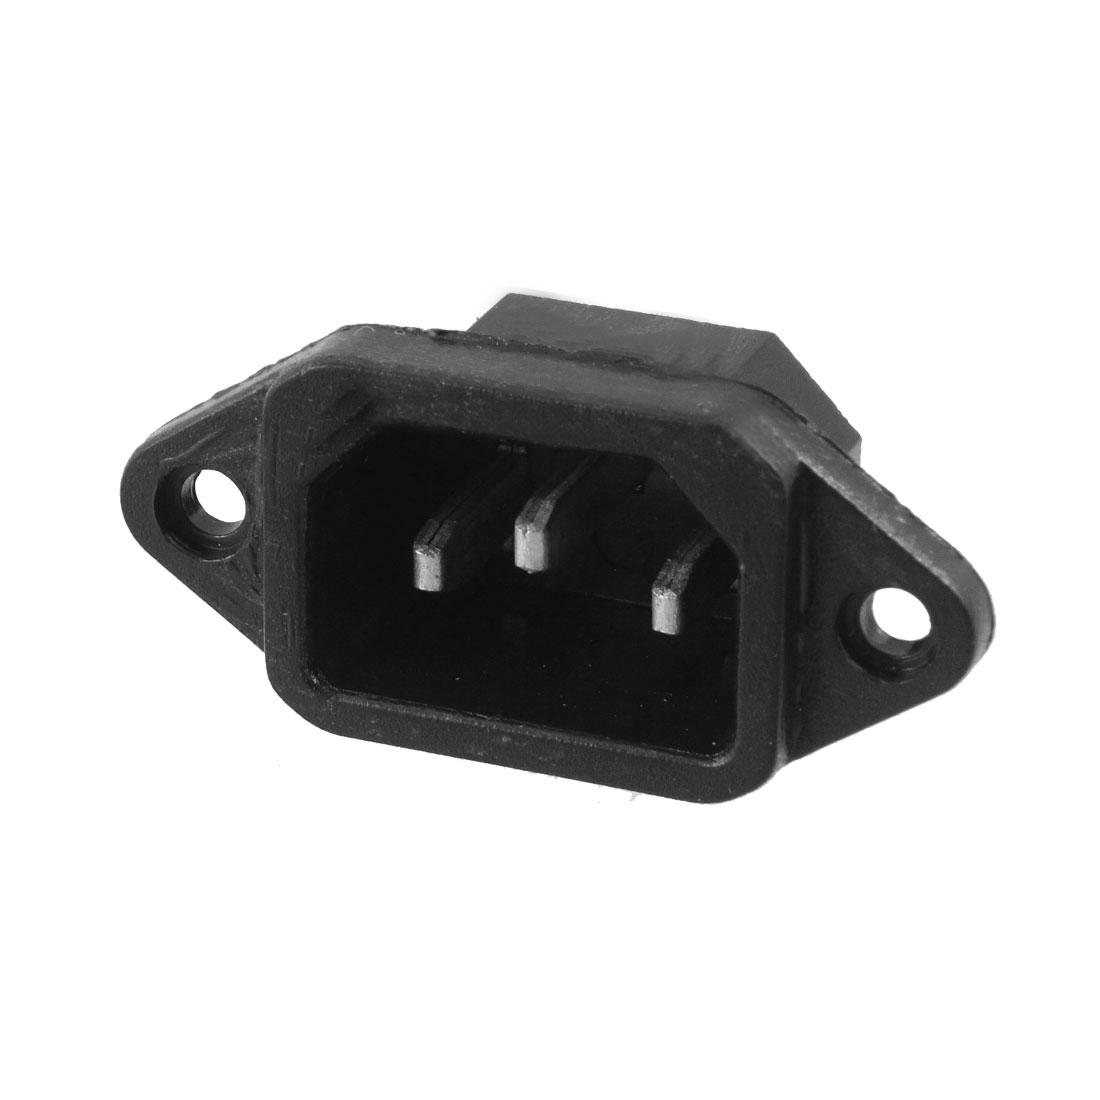 250V 10A Black Plastic C14 Power Supply Plug Adapter